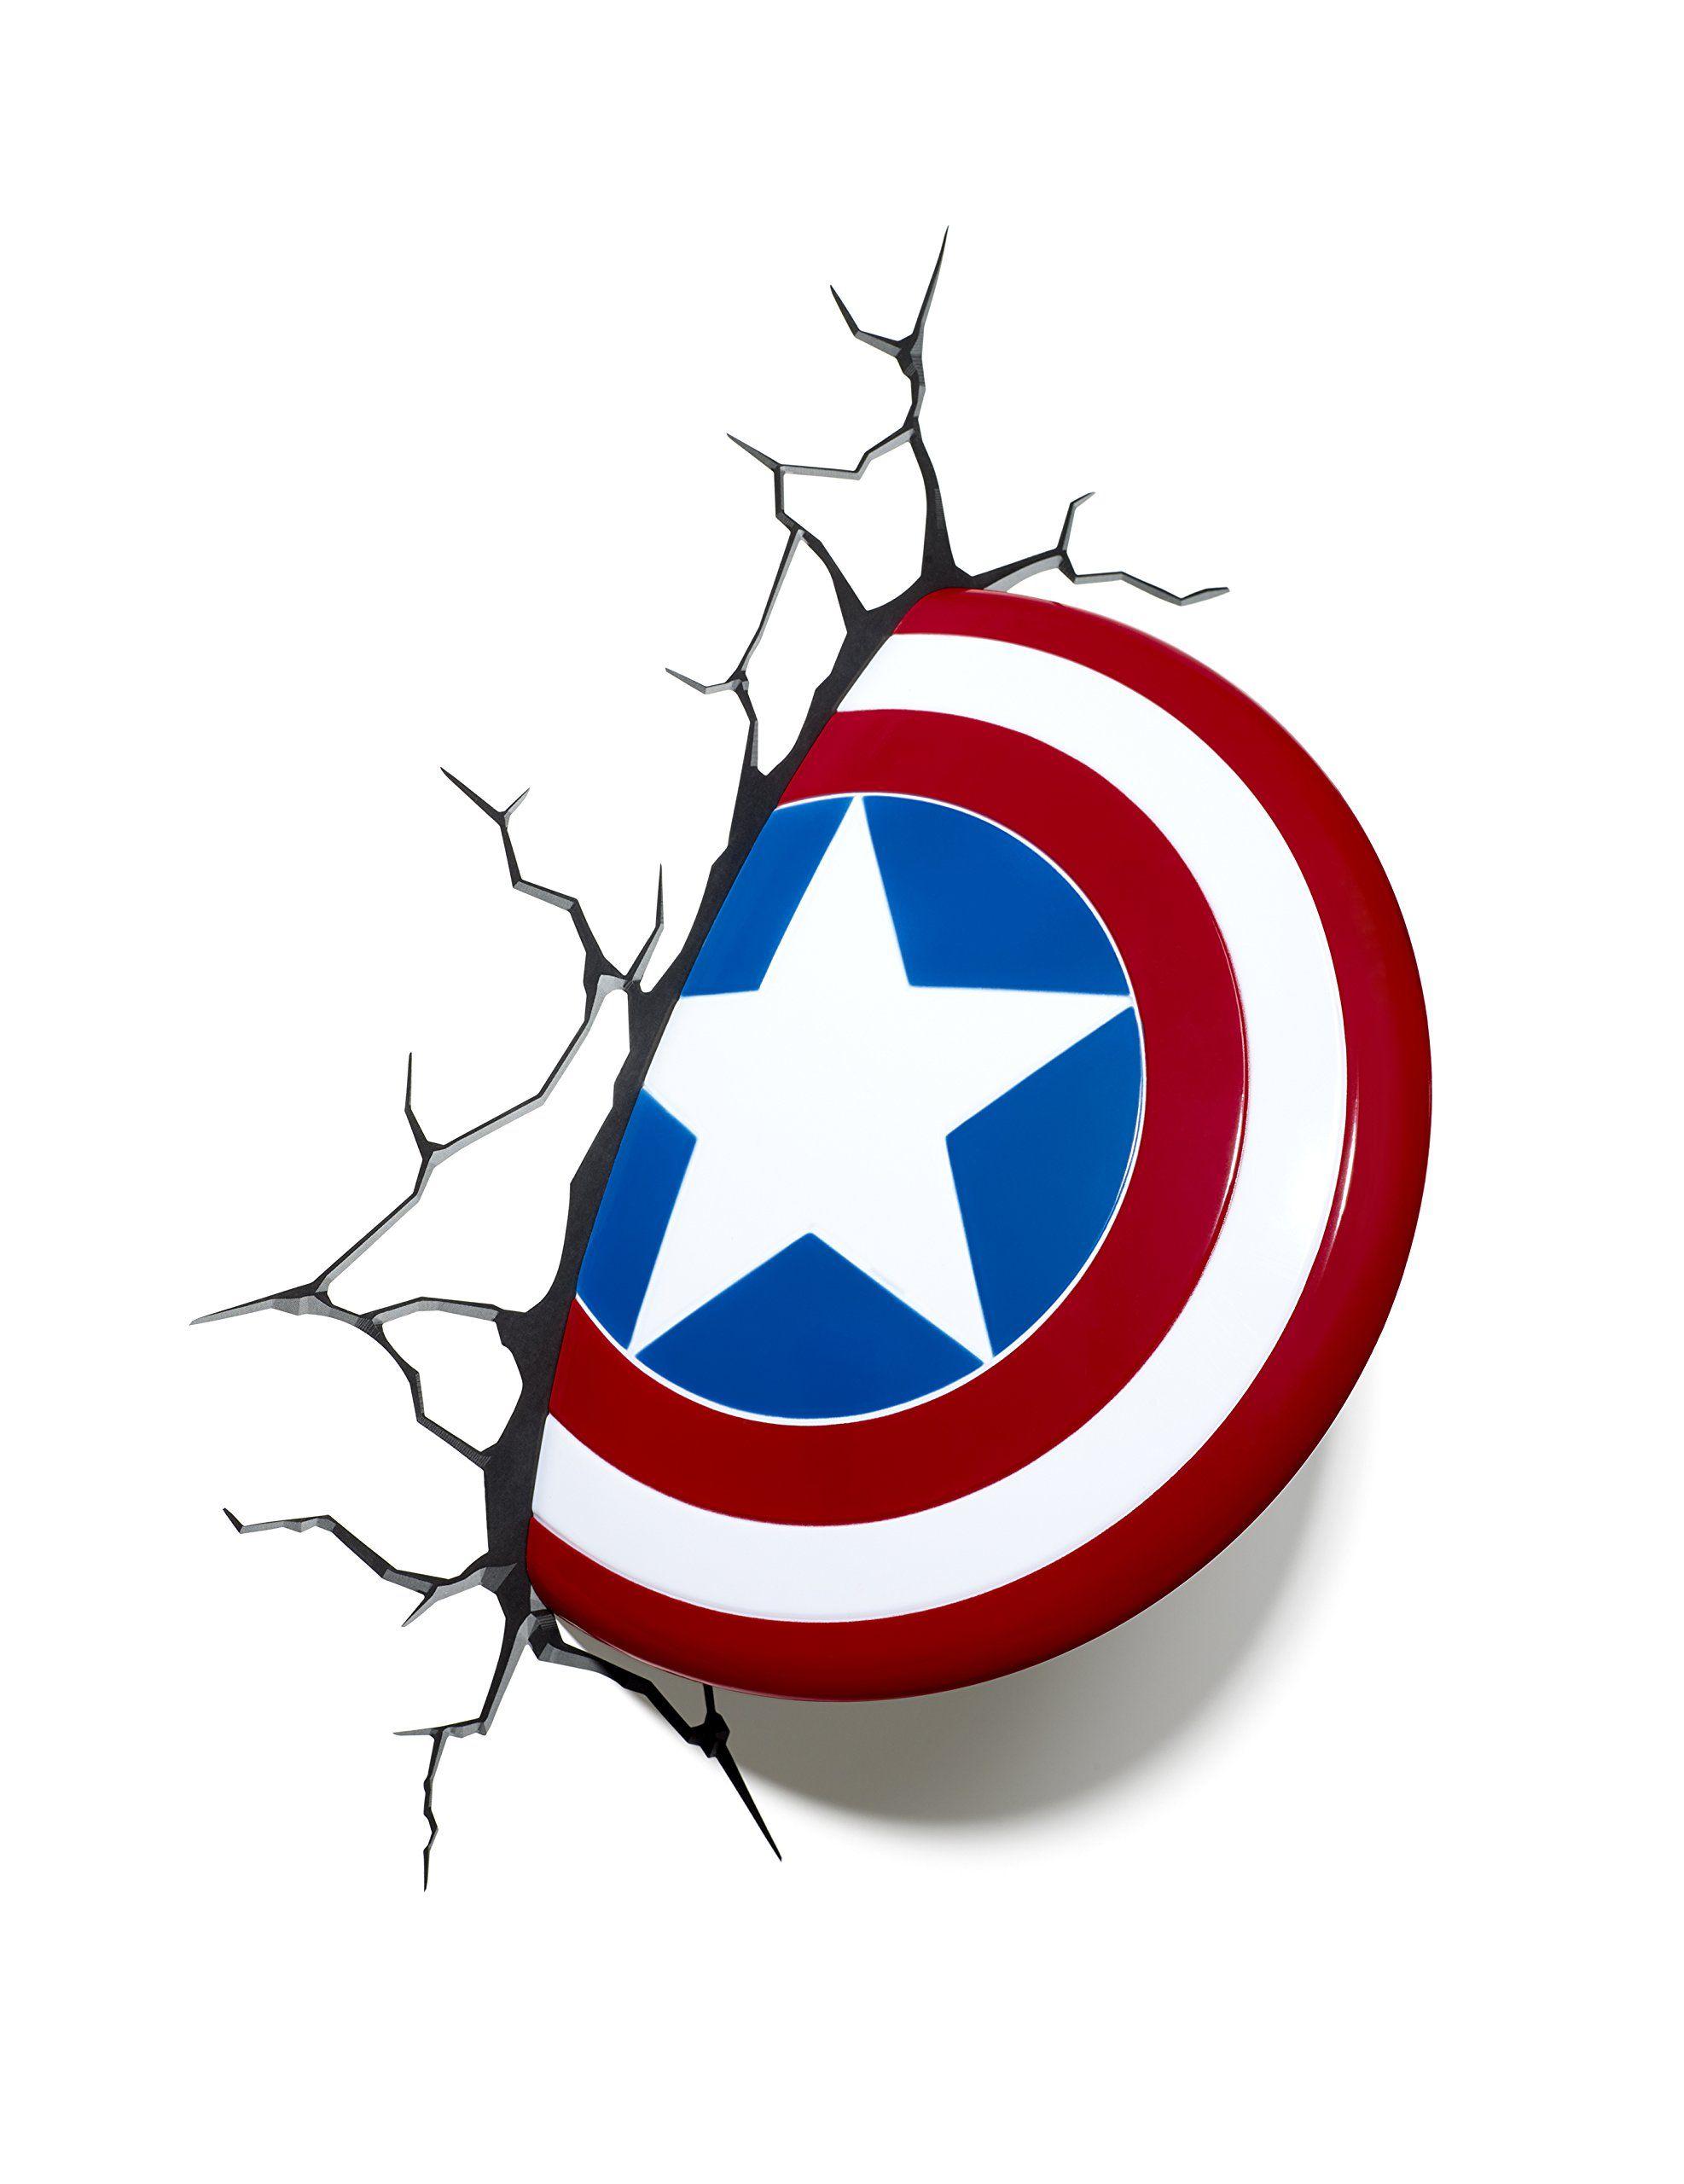 Marvel comics 3d captain america shield wall light amazonsmile marvel comics 3d captain america shield wall light amazonsmile aloadofball Choice Image